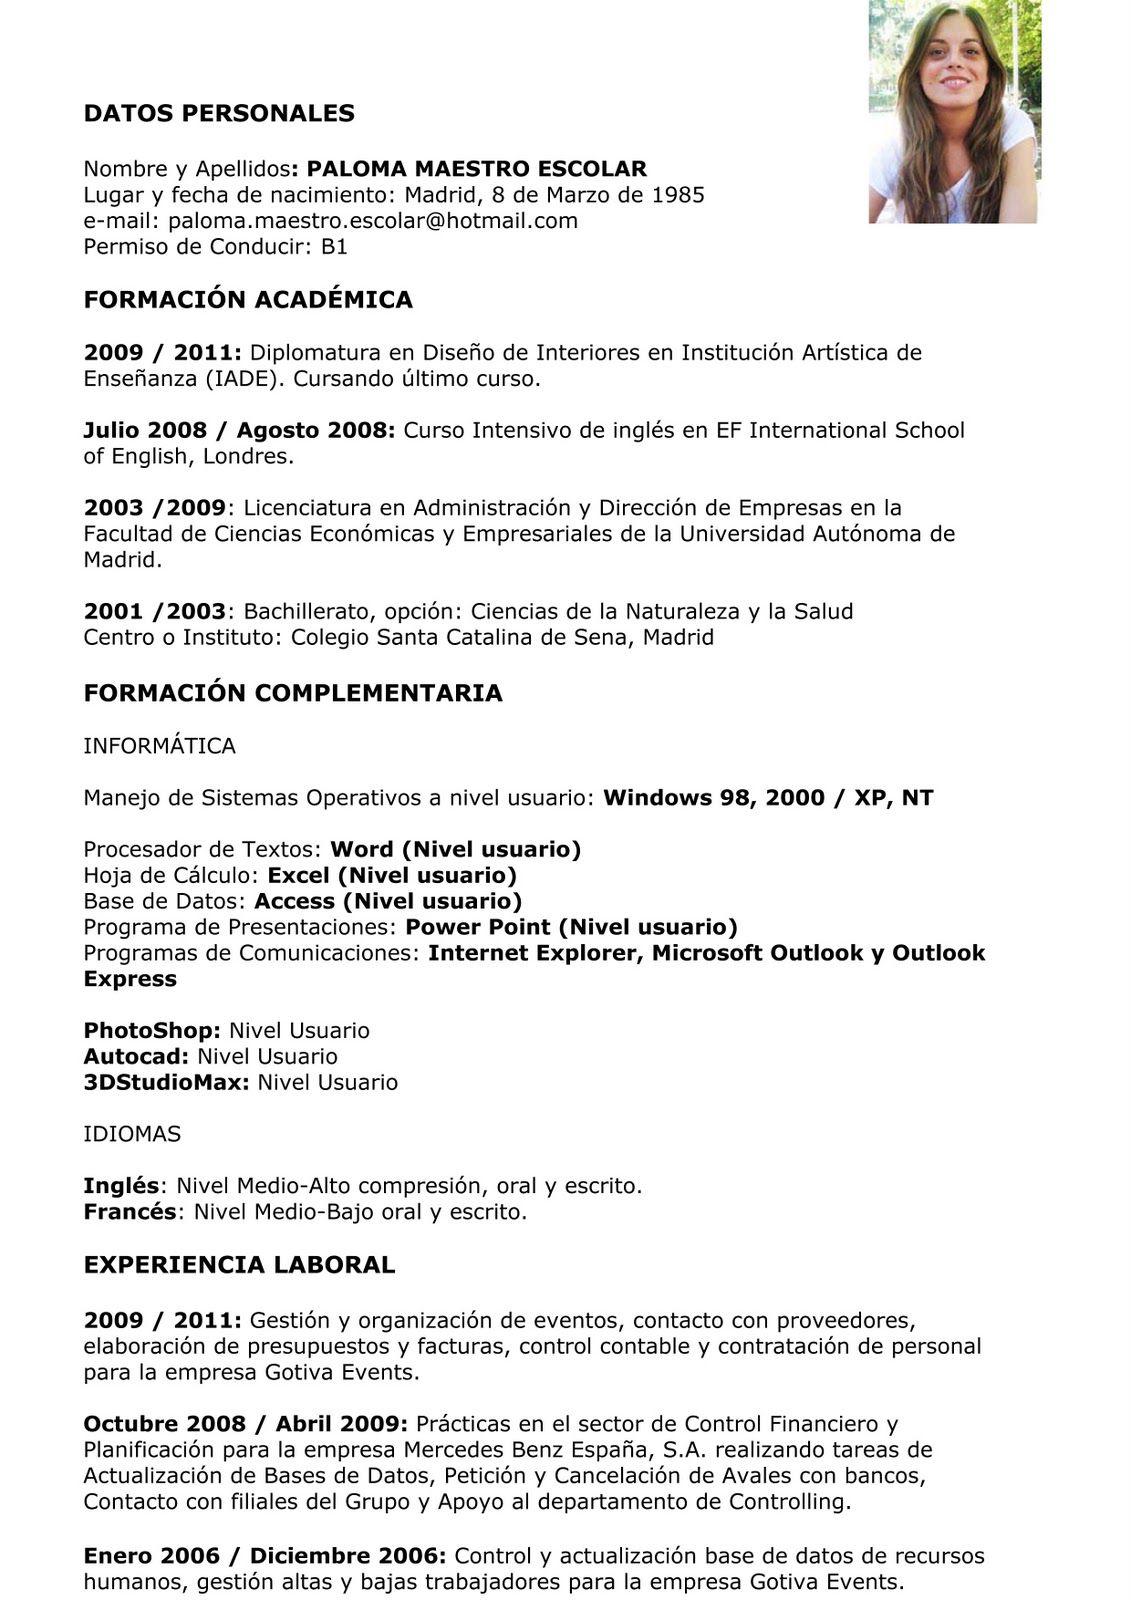 modelos de Curriculum-vitae.jpg (1131×1600) | Curriculum | Pinterest ...